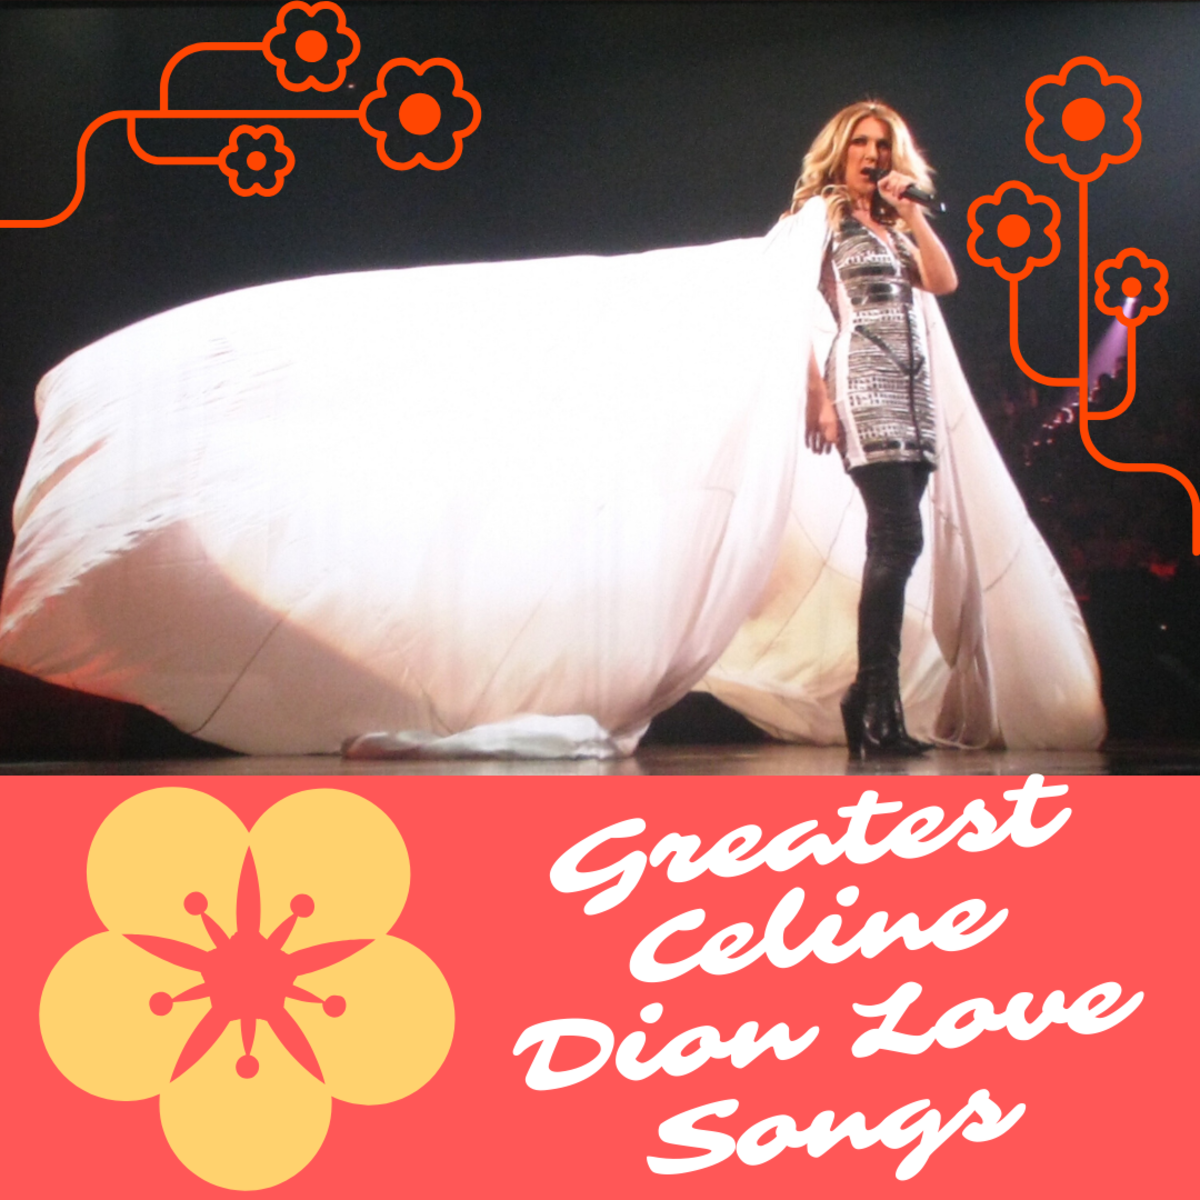 Top 10 Greatest Celine Dion Love Songs